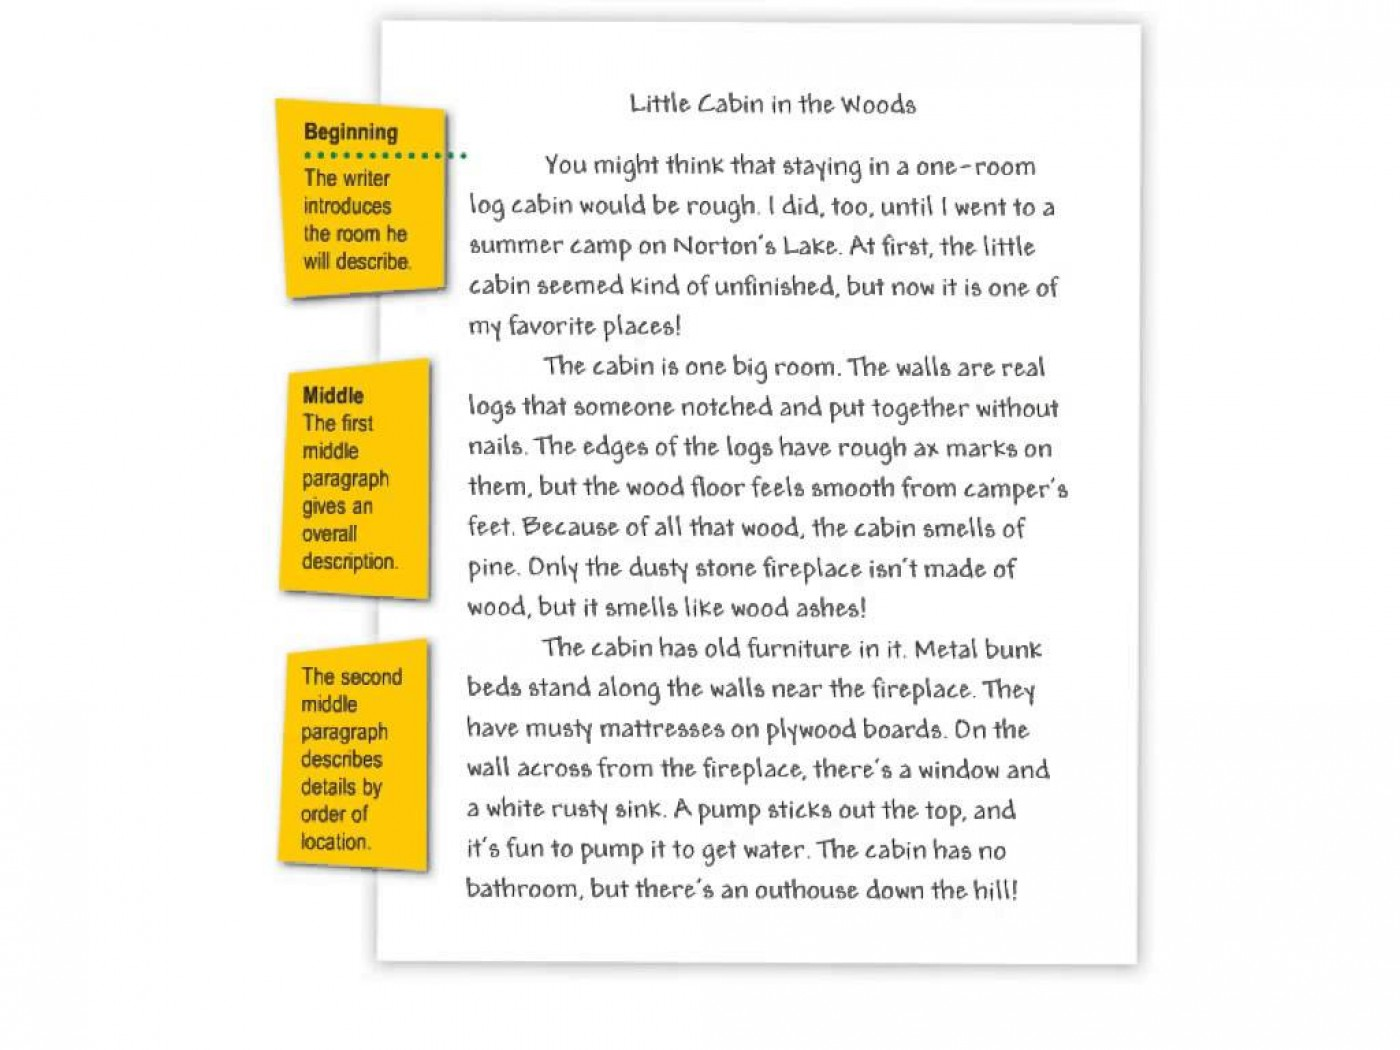 008 Narrative Descriptive Essay Samples Examples Sample Good Topics Maxresde Personal Example Amazing Essays About A Person Pdf Free Spm 1400